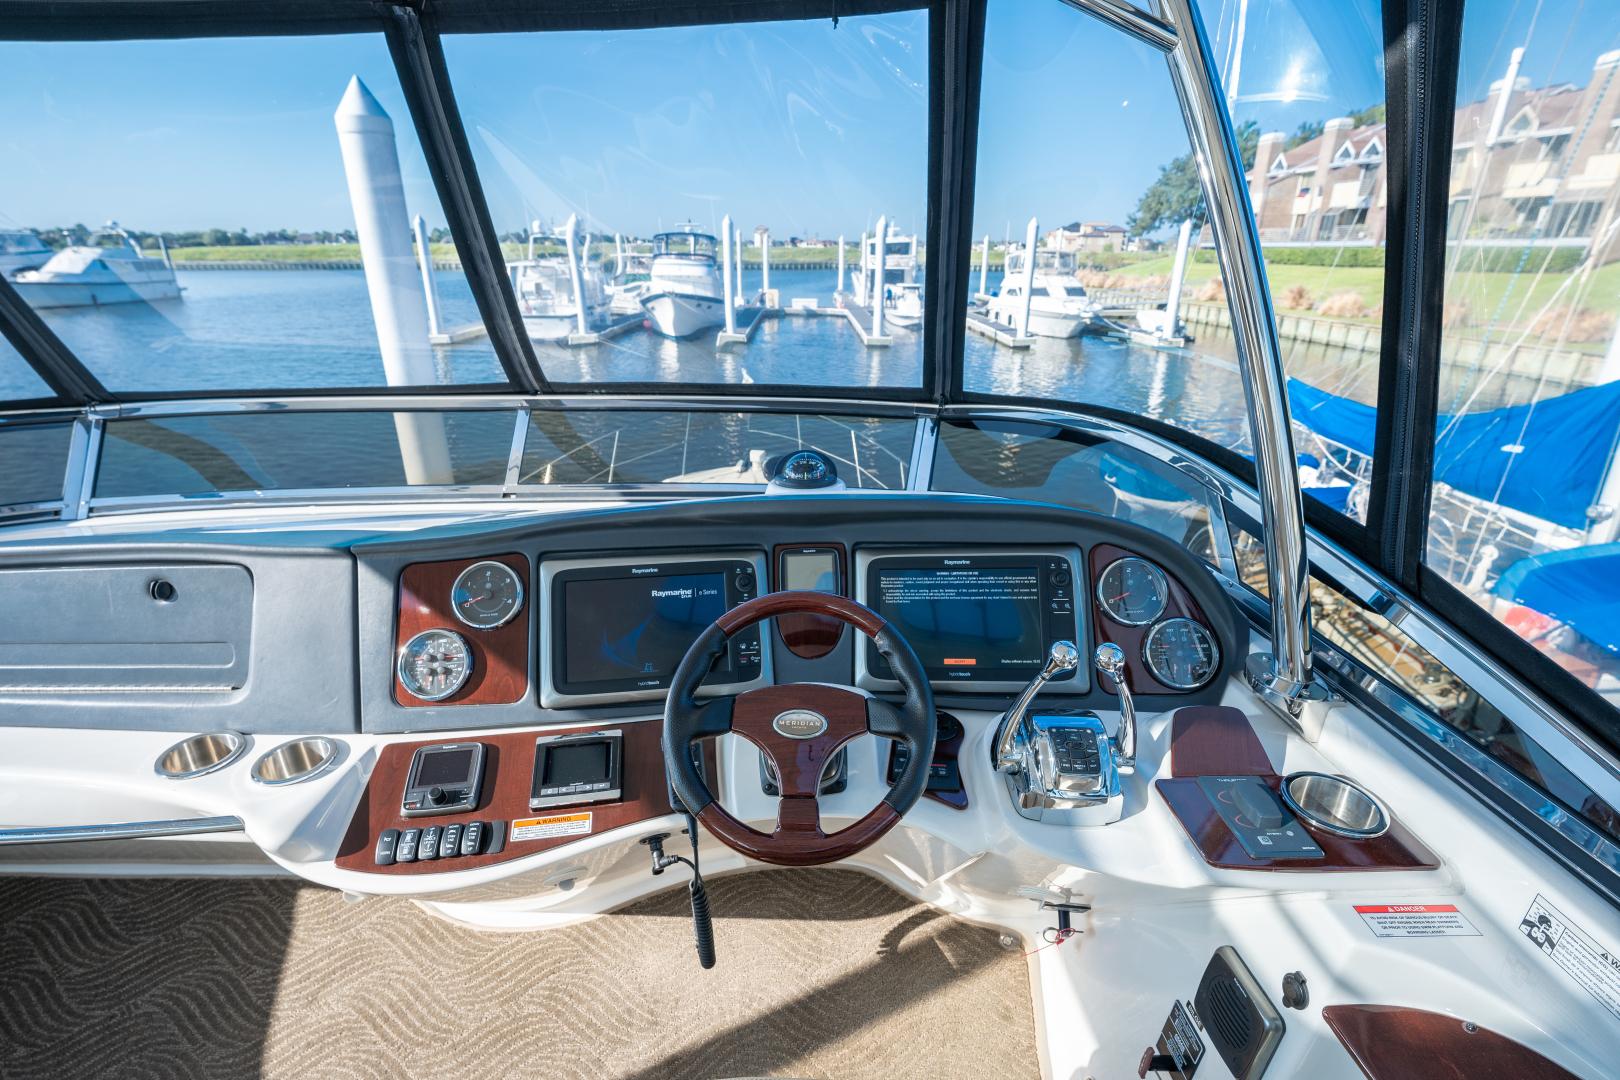 Meridian-441 Motor Yacht 2016-Friend Ship League City-Texas-United States-Meridian 441 2016 Friend Ship-1508183 | Thumbnail